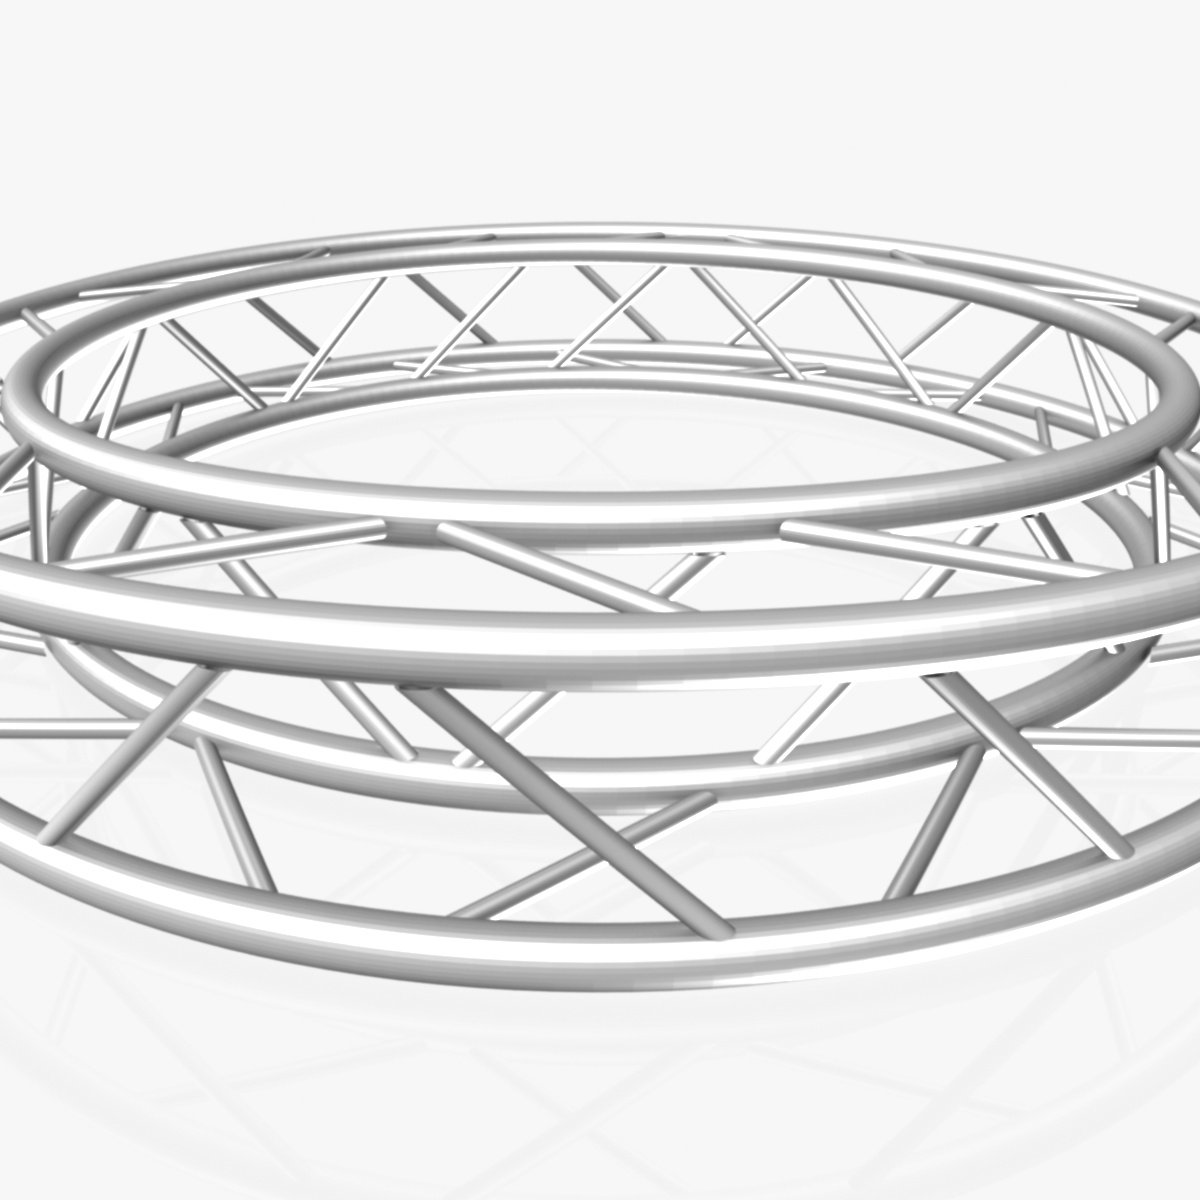 дугуй дөрвөлжин Дотоод (бүрэн диаметр 200cm) 3d загвар 3ds max dxf fbx c4d dae obj 252358